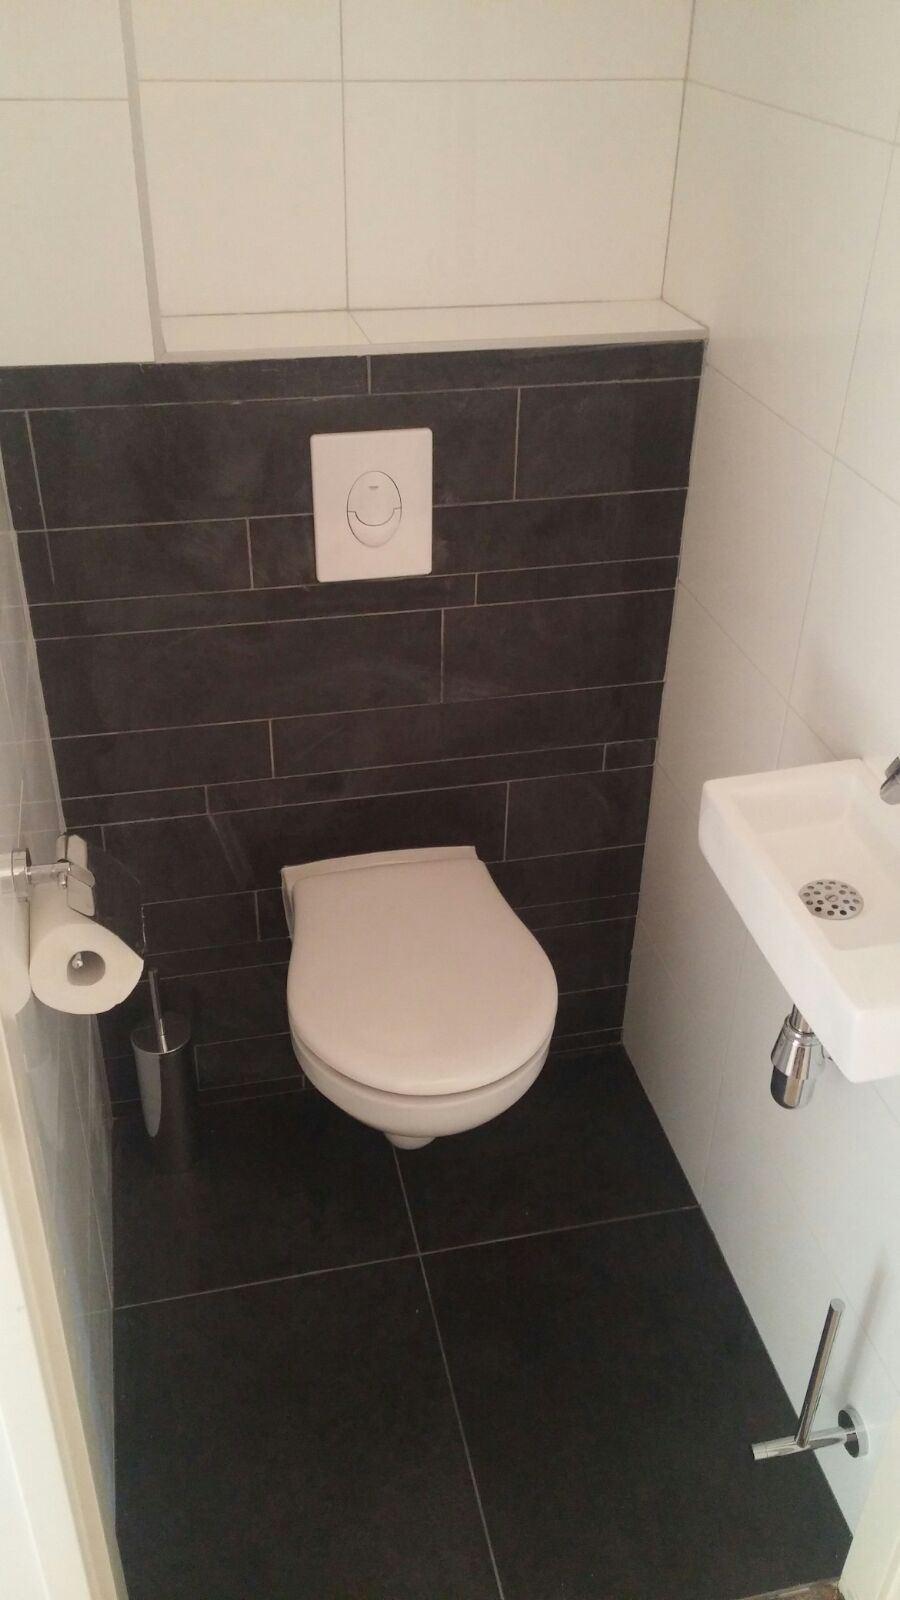 Verbazingwekkend Toilet renovatie - De Klussenier Pedro van Boxtel OU-39